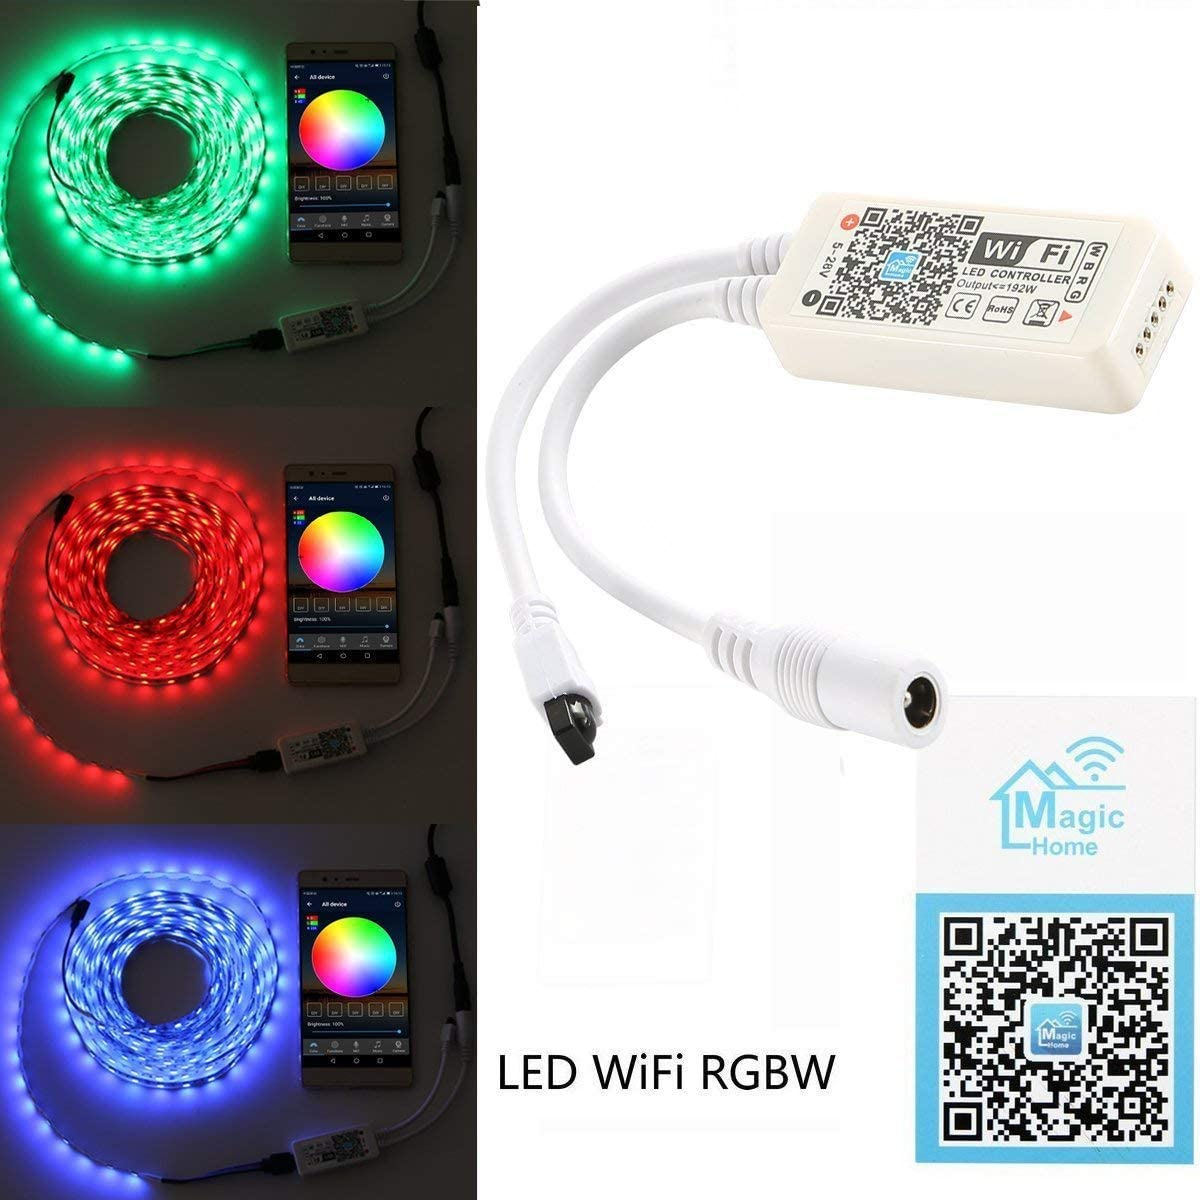 Control Remoto Infrarrojo Cikuso Controlador de Tira Led Rgbw Inteligente Wifi Compatible Con Android Ios Worke Con Alexa Ir 24 Teclas Inal/ámbrico Para Luces de Tira Multicolor